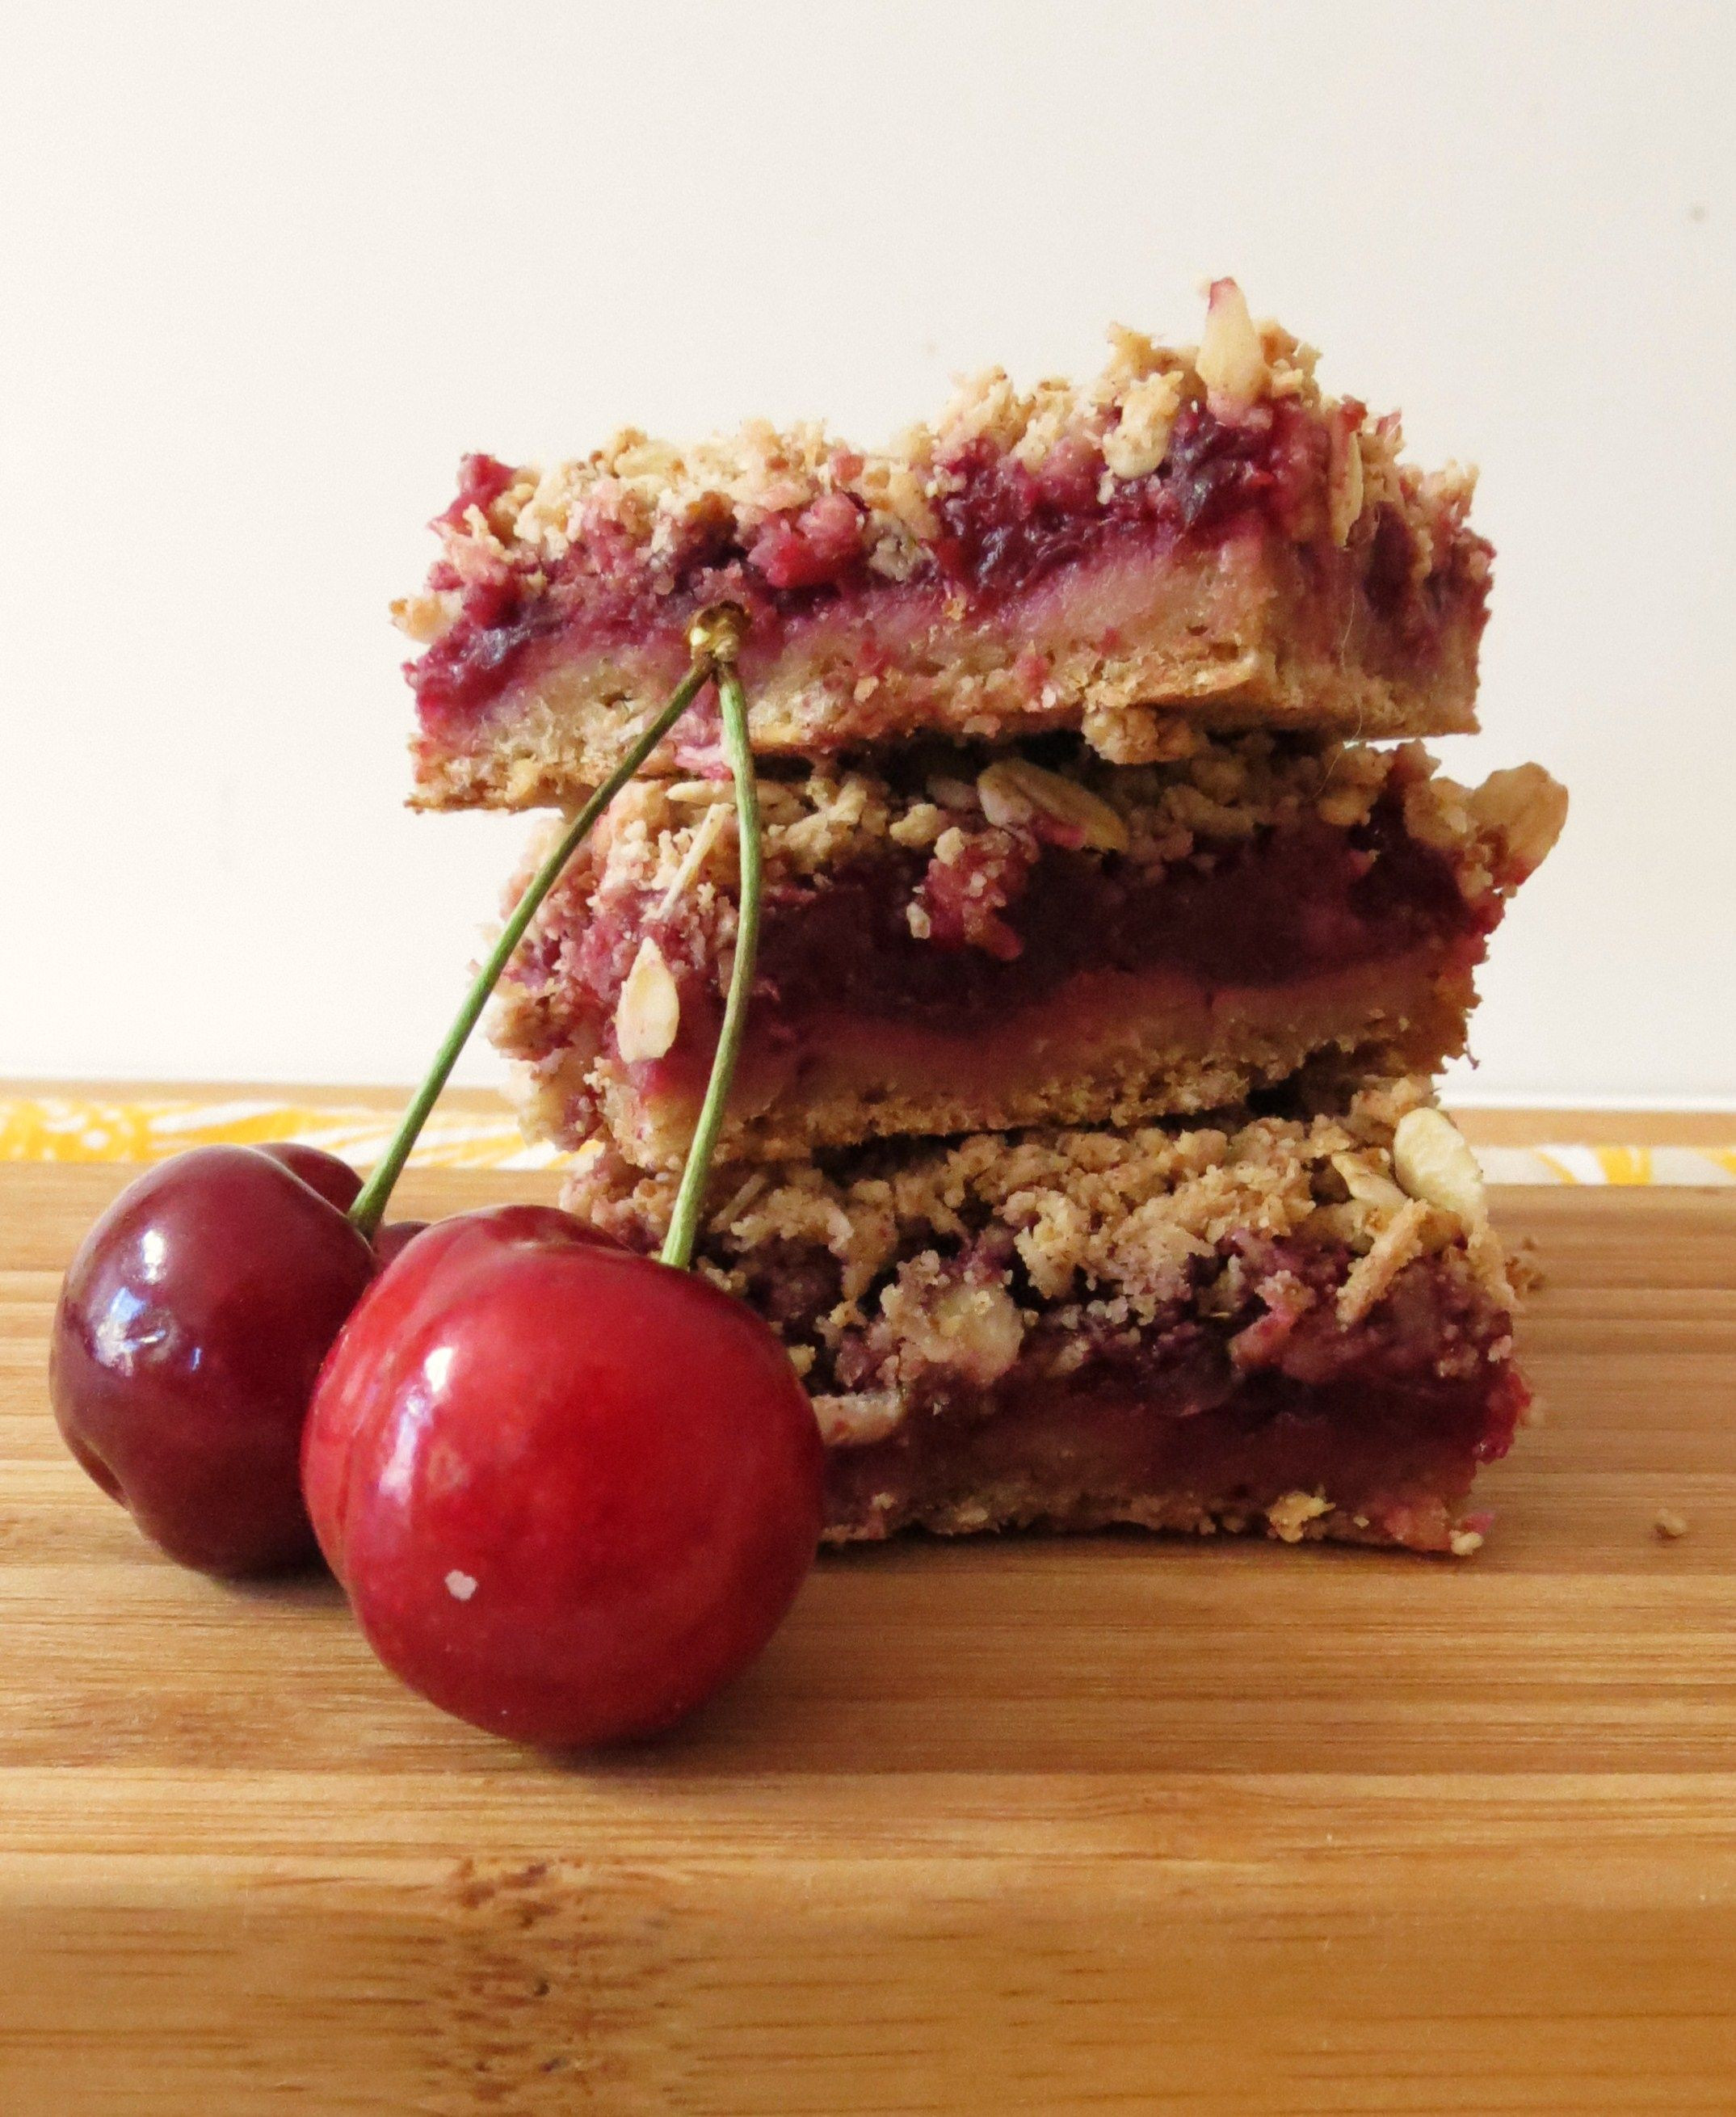 Healthy Cherry Dessert  Cherry Pie Crumble Bars Recipe